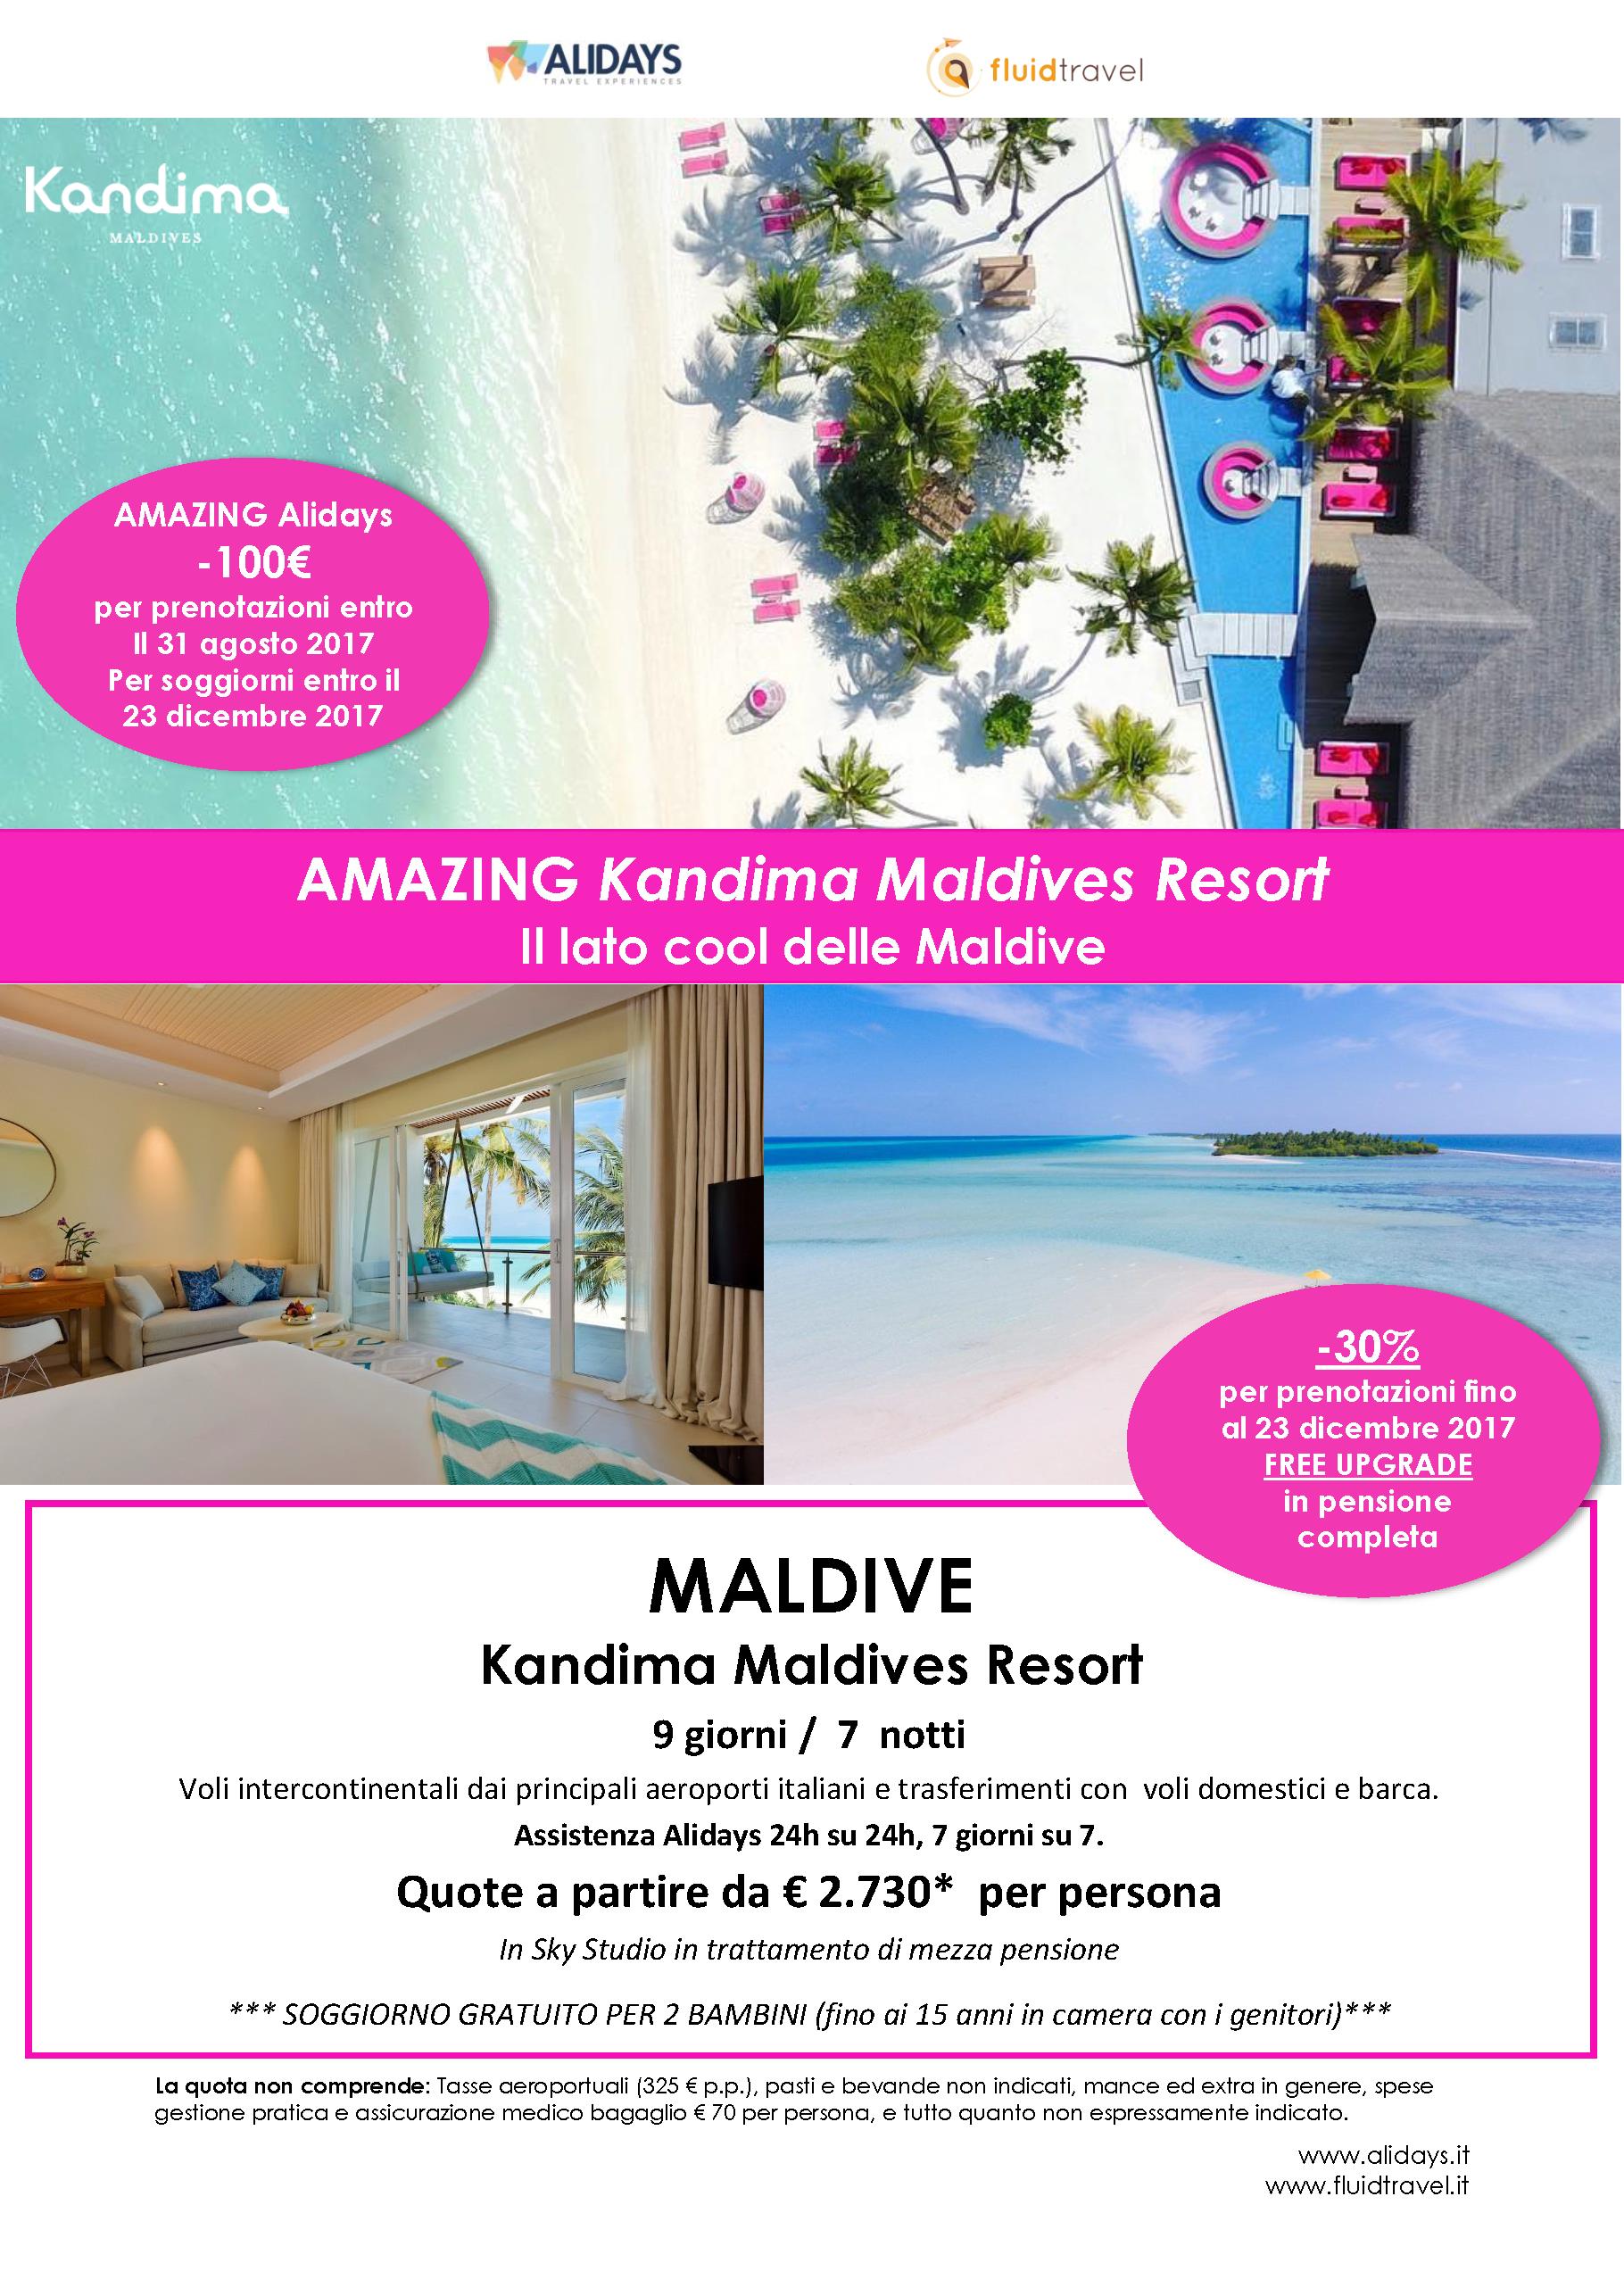 Mondintero- Agenzia Viaggi ad Alassio » Maldive Kandima Resort